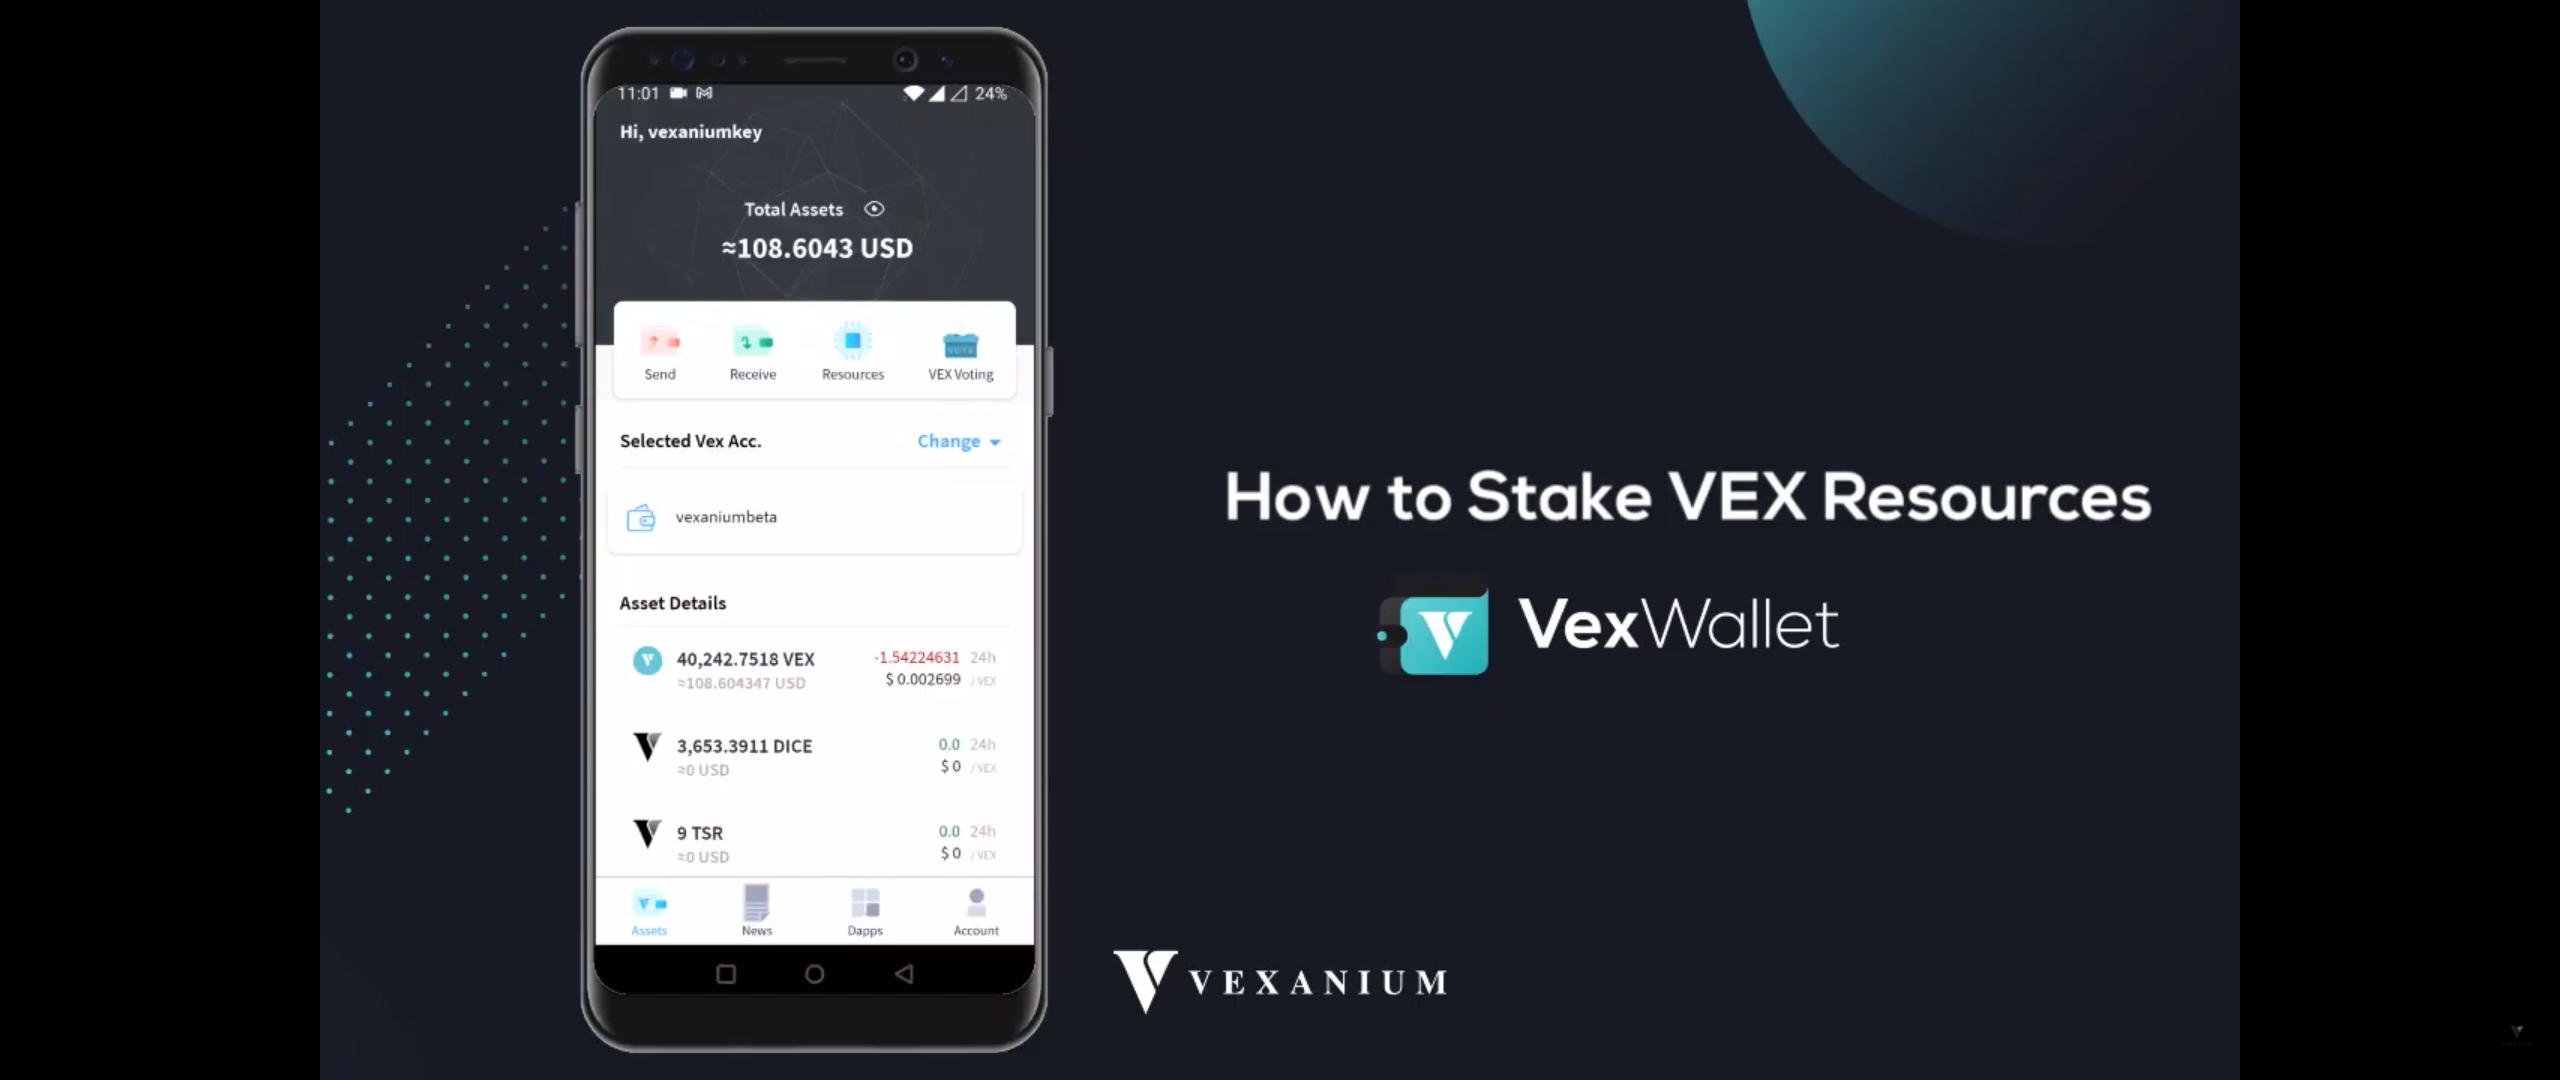 Cara Stake VEX Resource dengan Vex Wallet